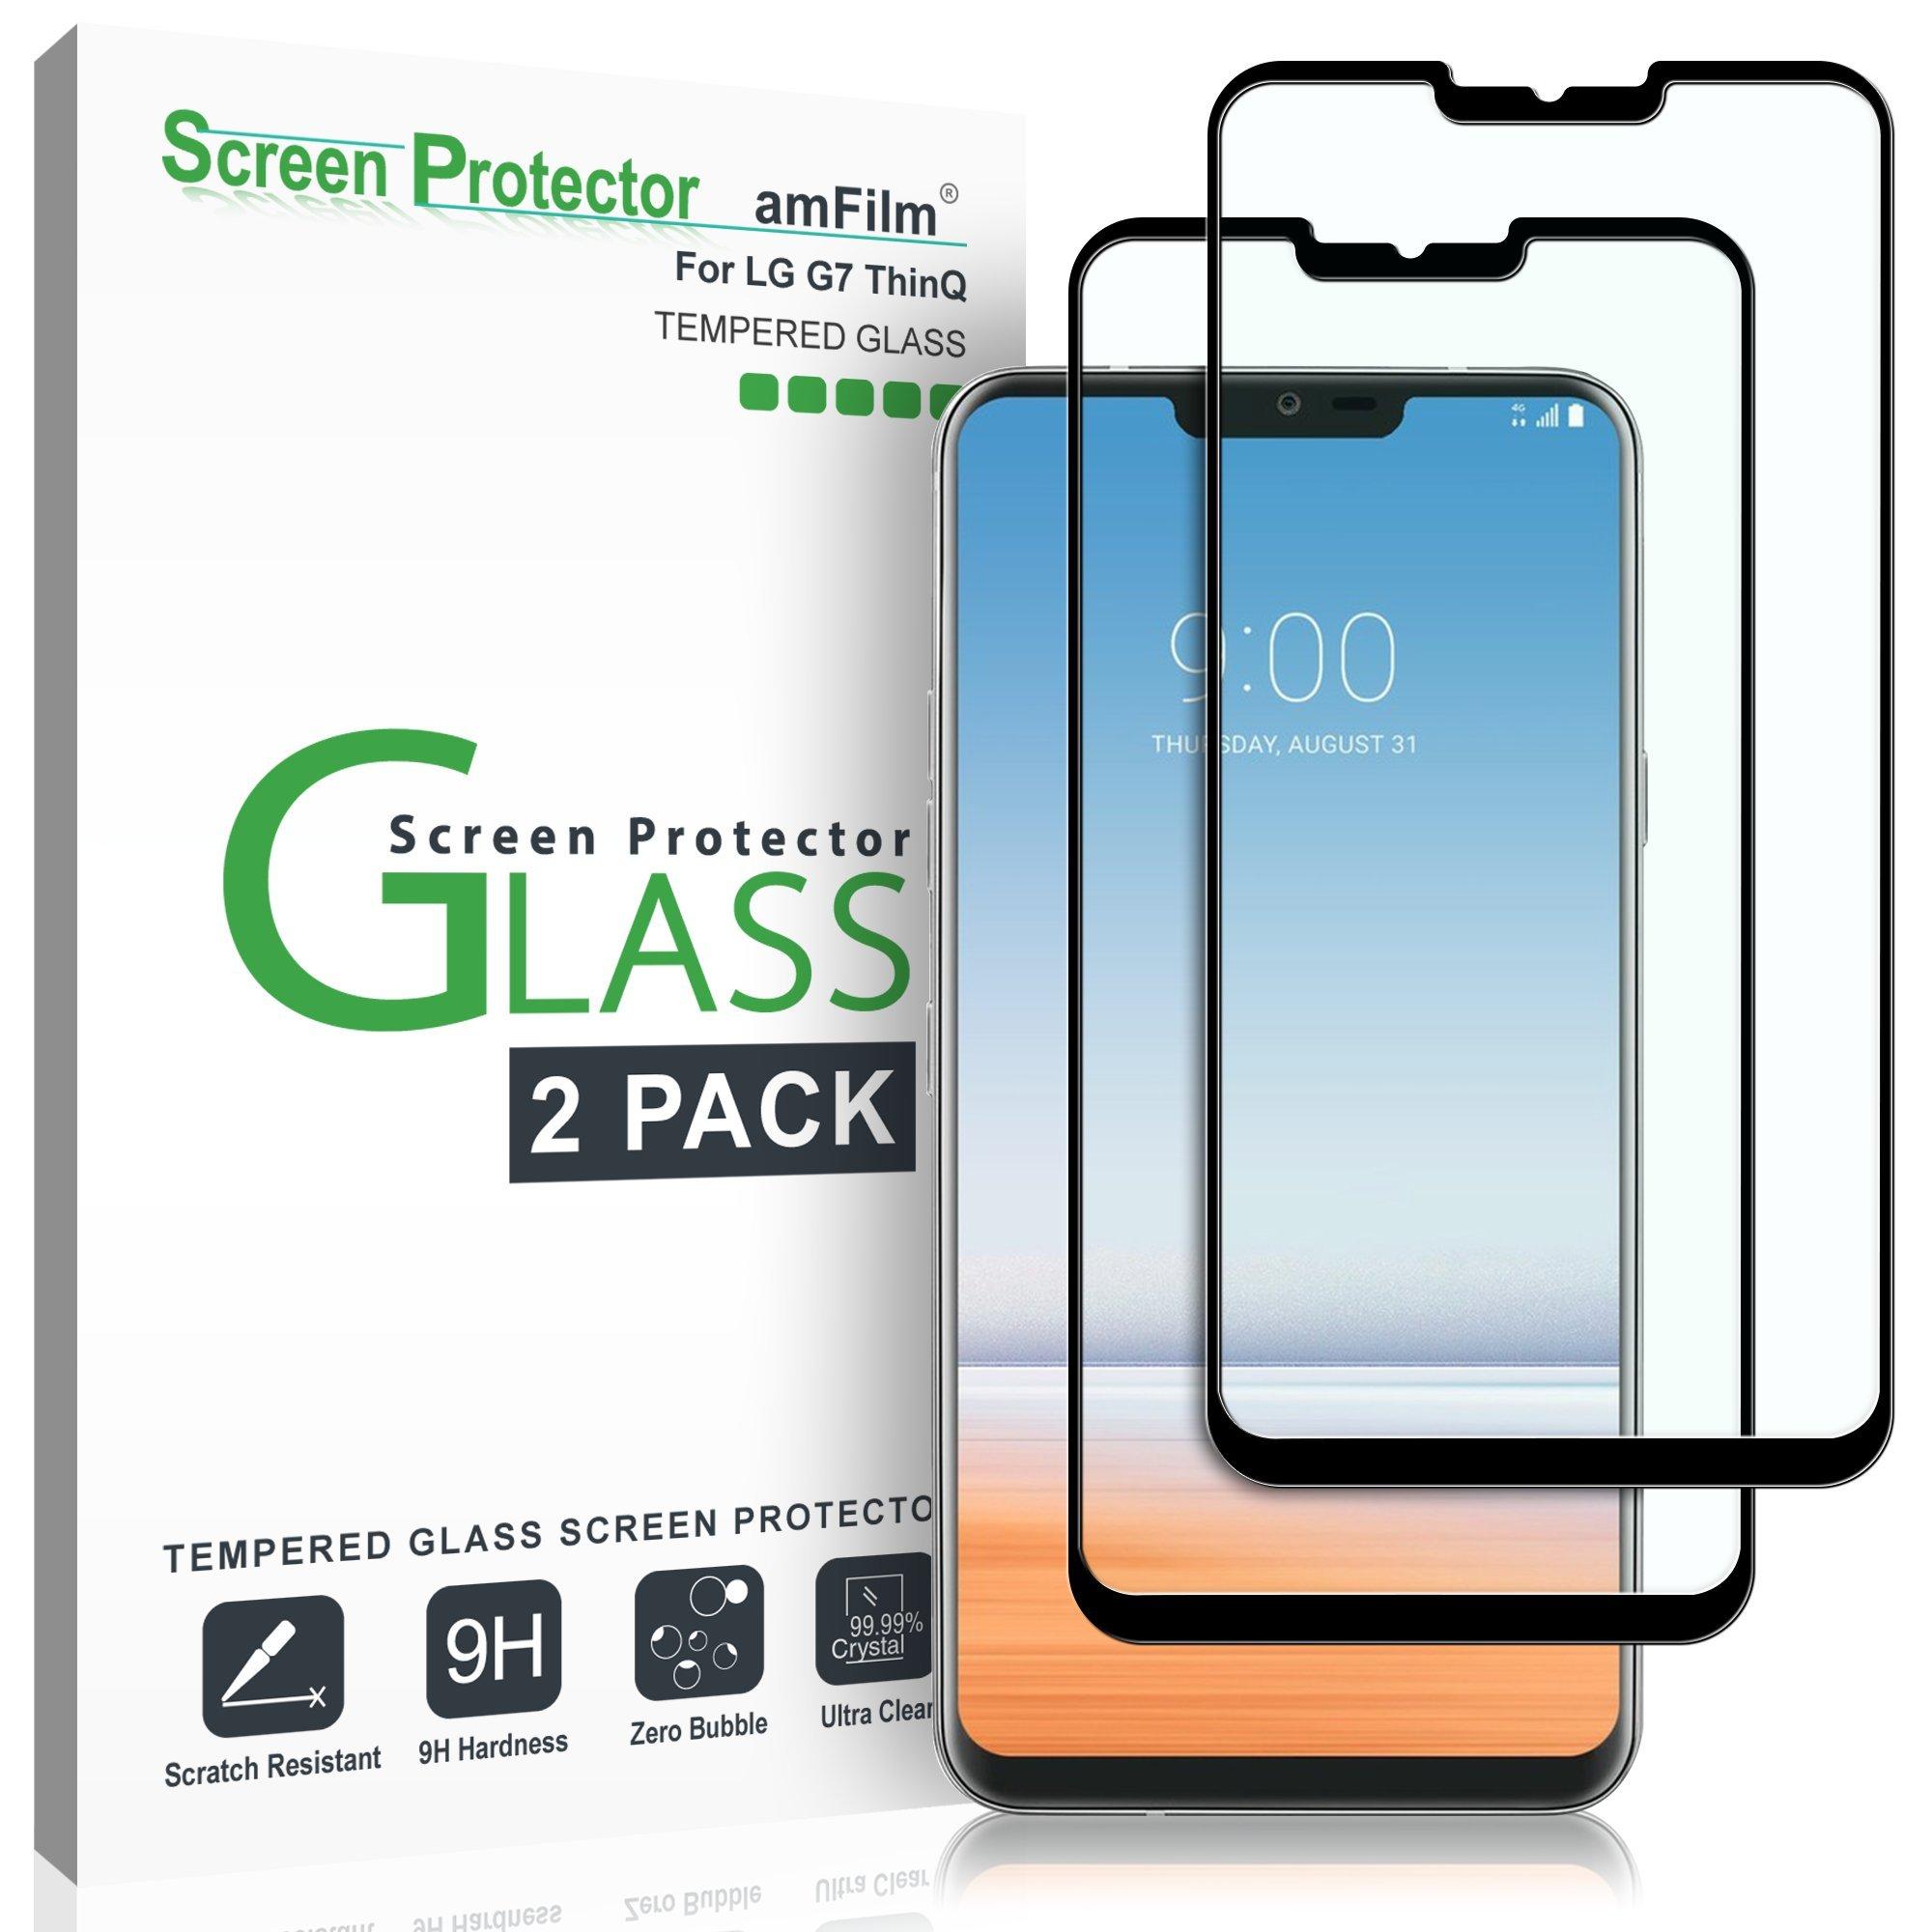 High Sensitivity Tempered Glass amFilm Glass Screen Protector for Google Pixel 2 Dot Matrix